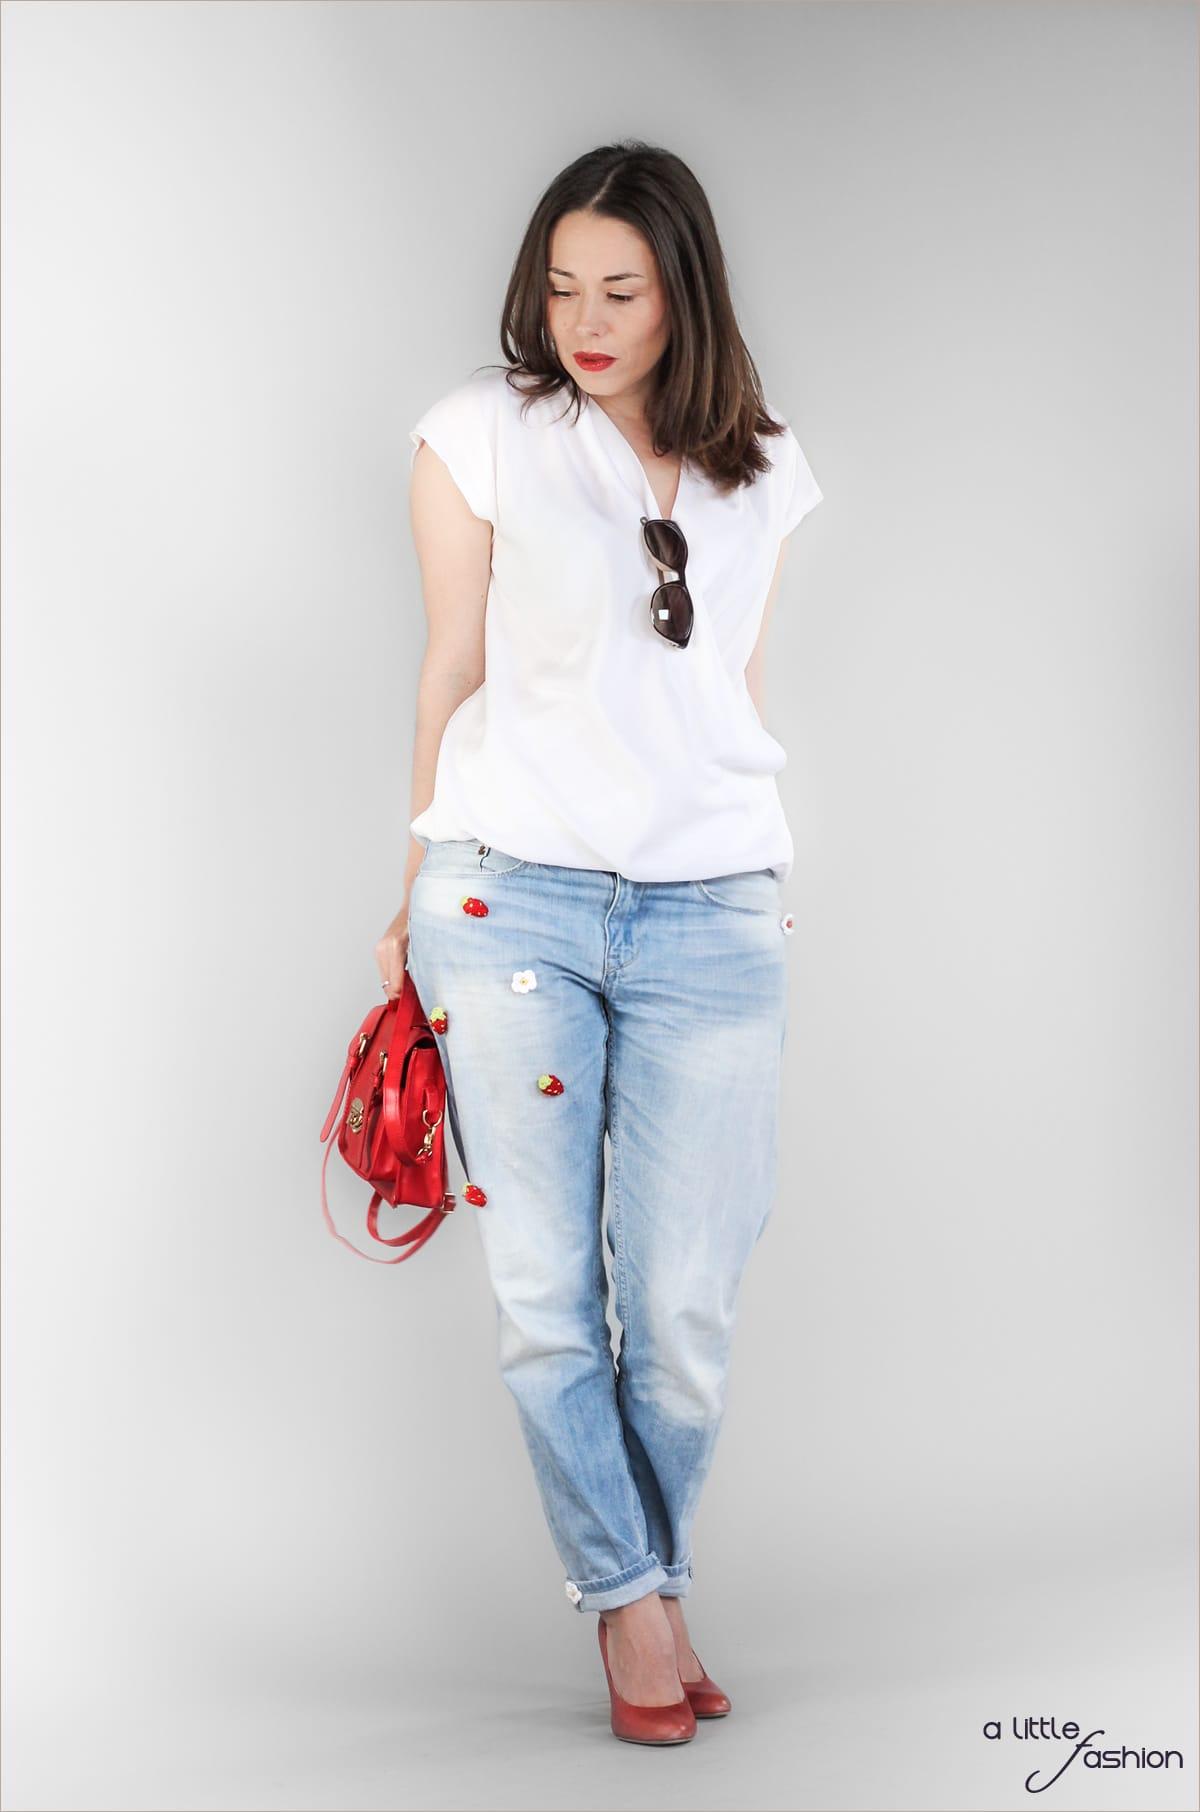 fashion_outfit_patched-boyfriend-jeans_hose_bluse_lizali_erdbeer_sonnenbrille7-min